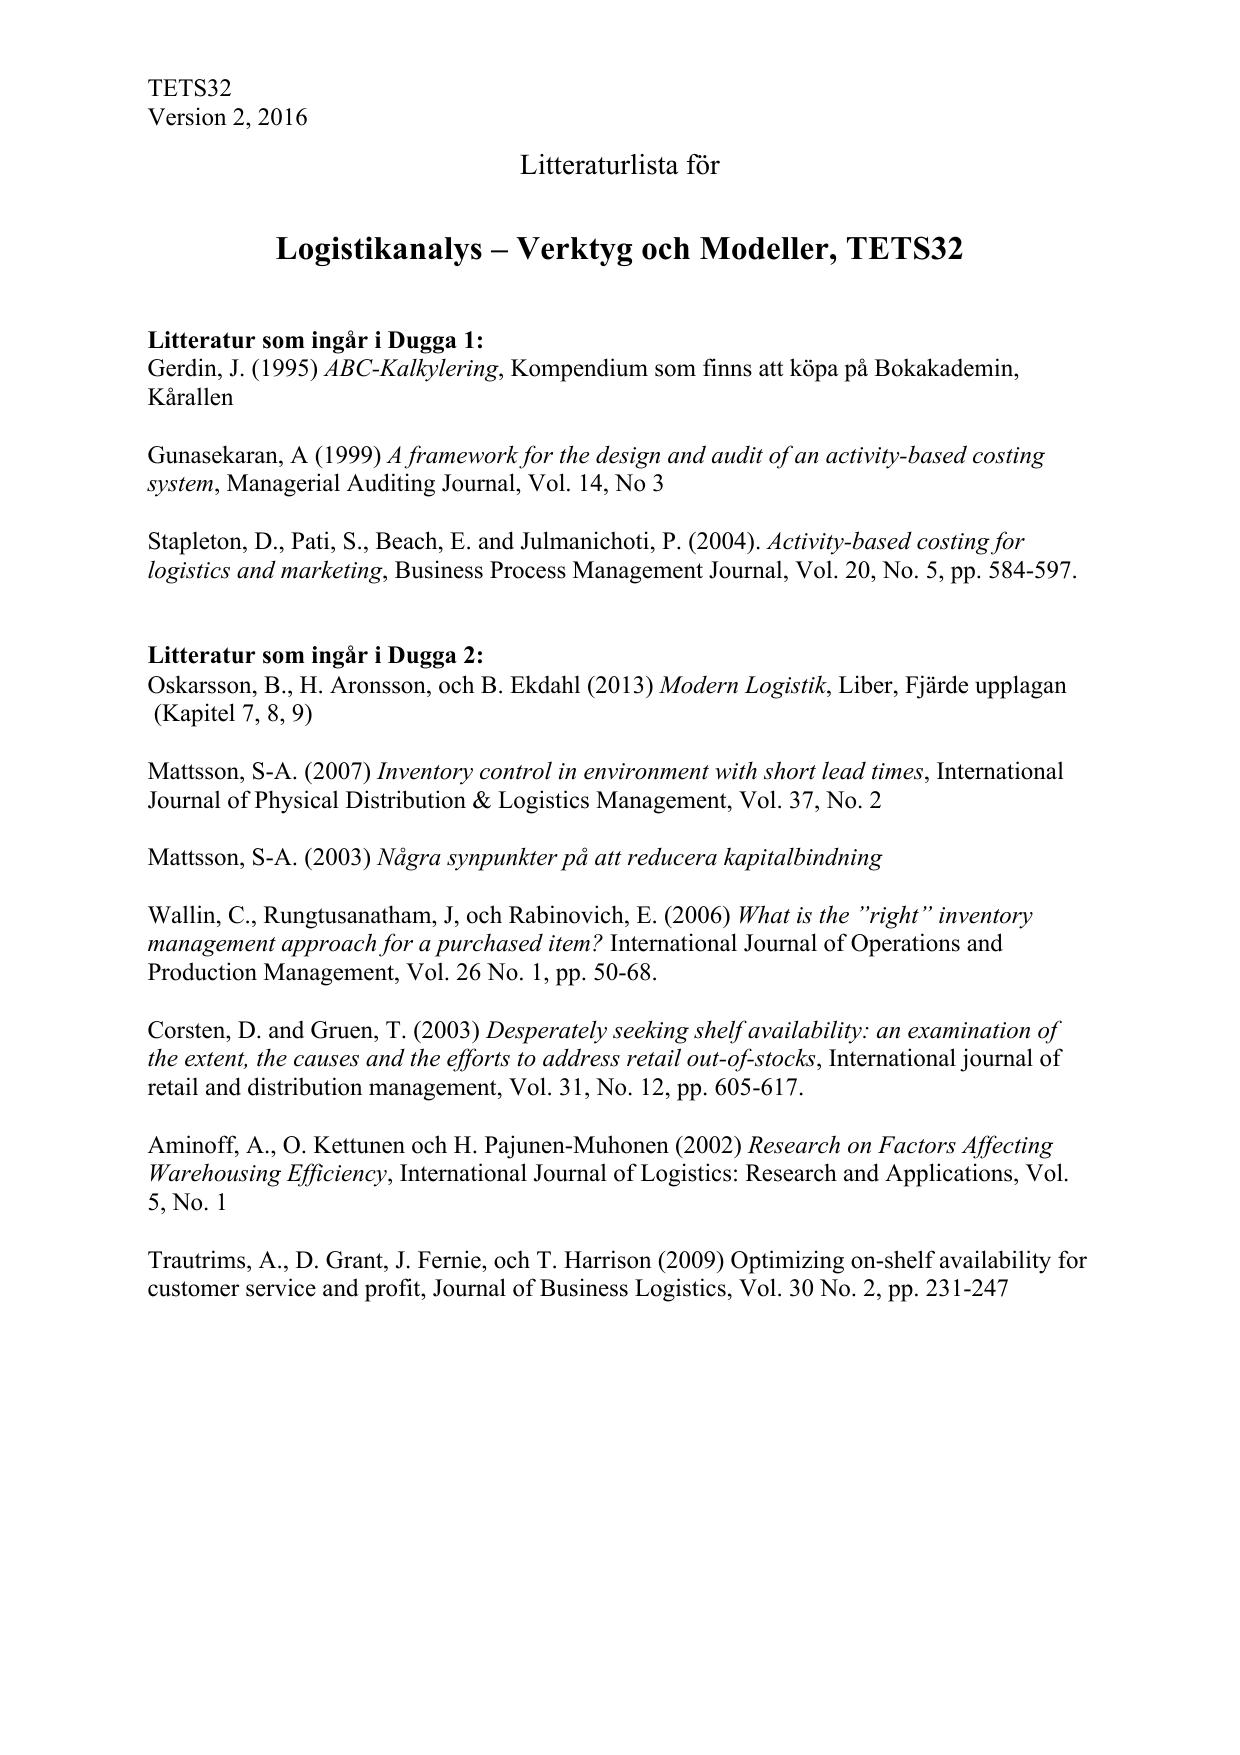 Litteraturlista 2016 version 2 pdf